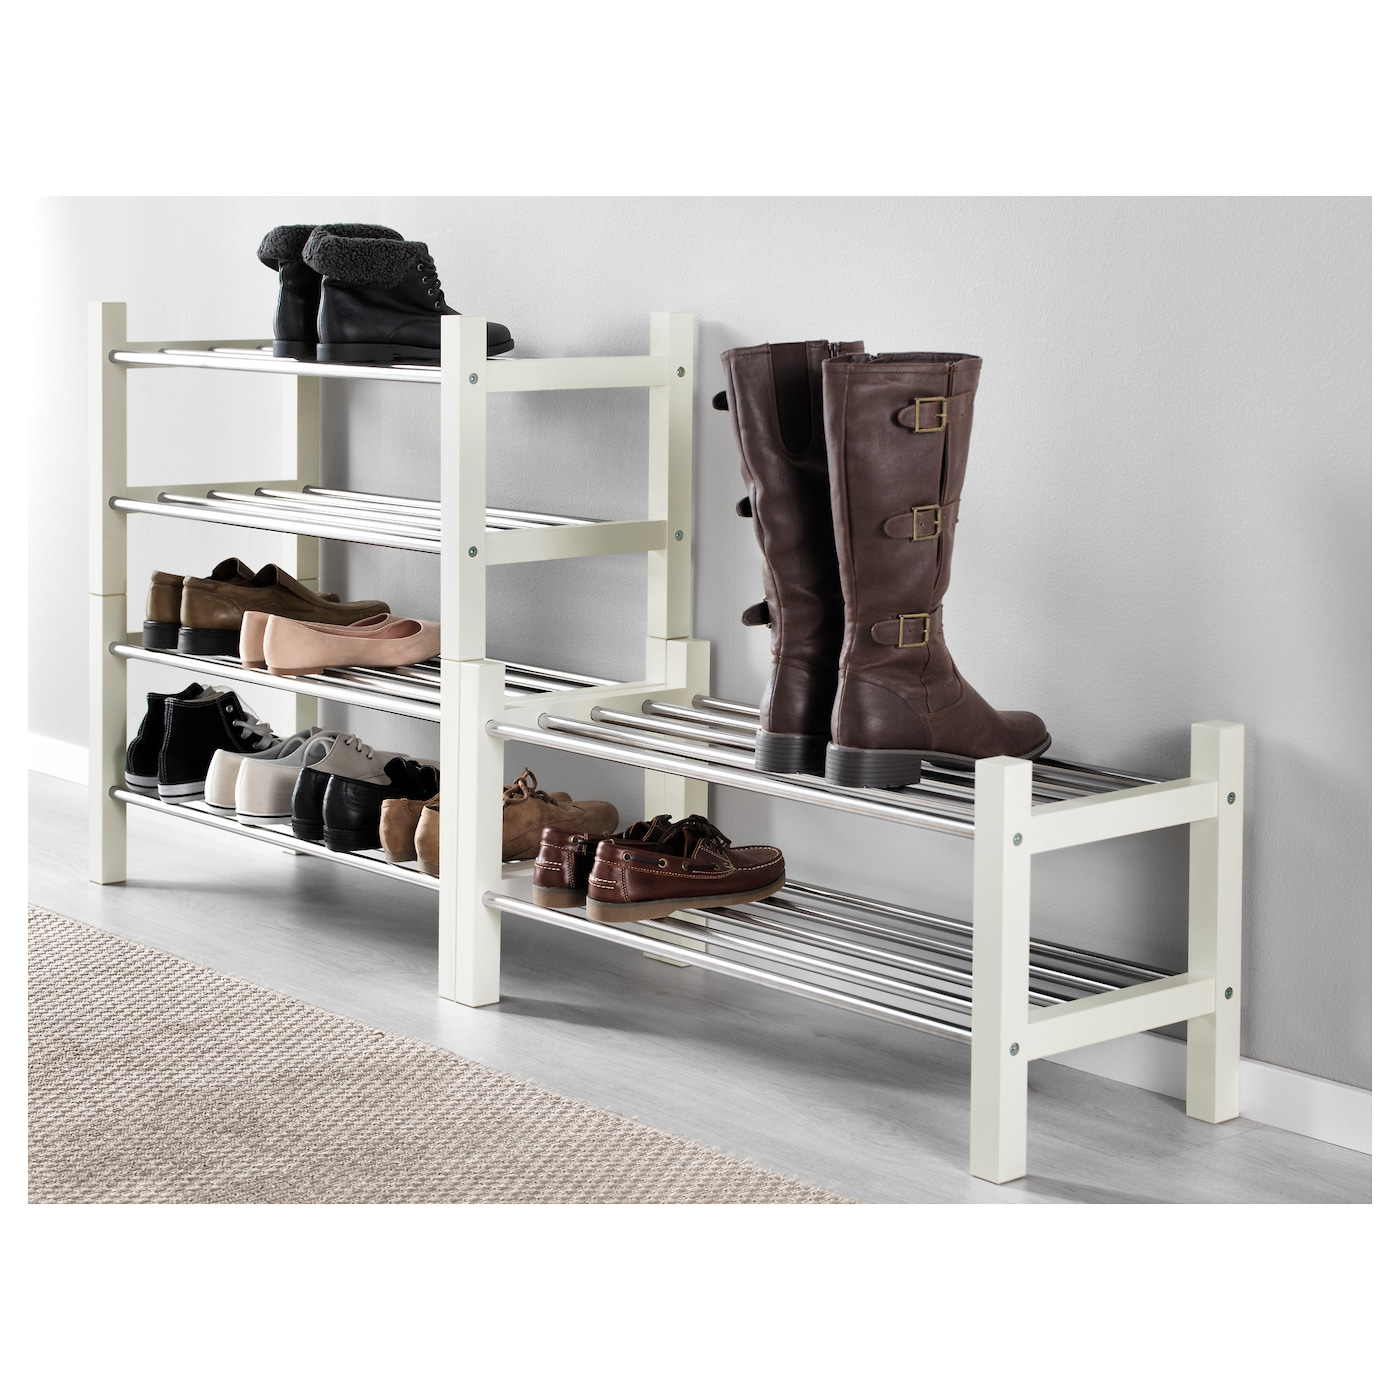 tjusig tag re chaussures blanc 79 cm ikea. Black Bedroom Furniture Sets. Home Design Ideas